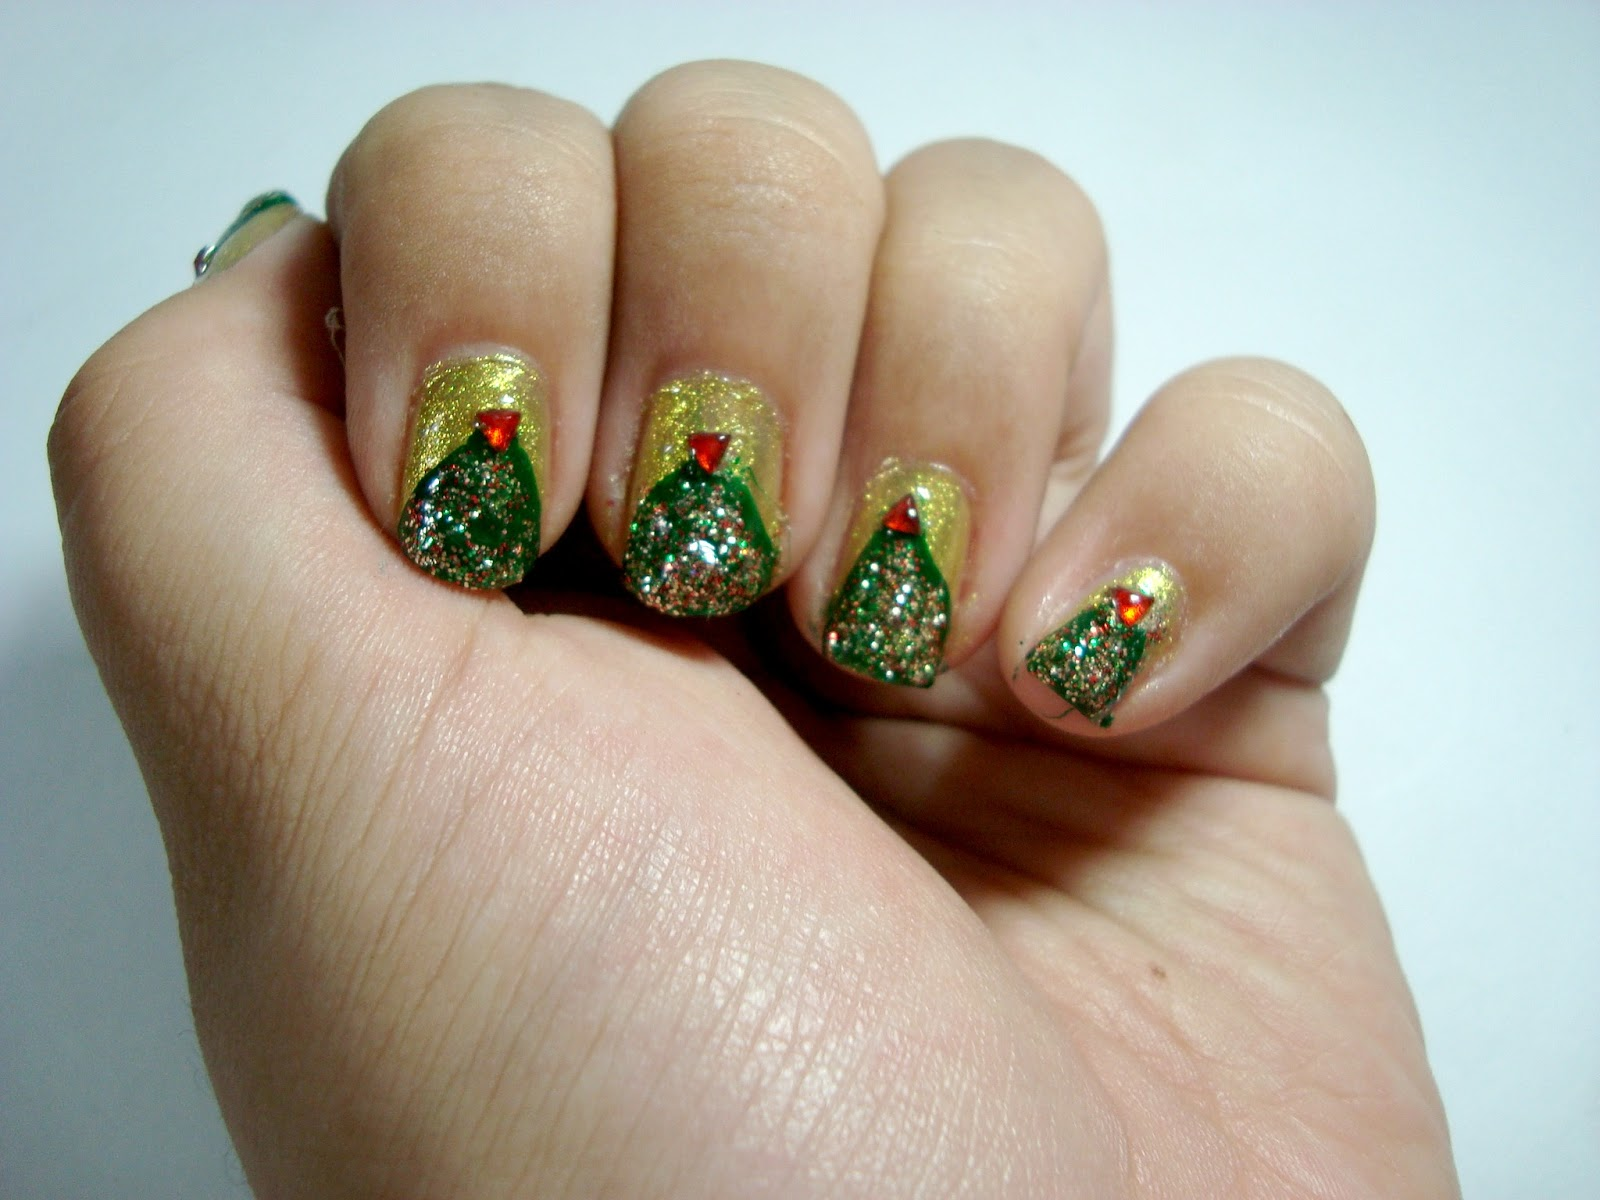 Nails | Oh Christmas Tree